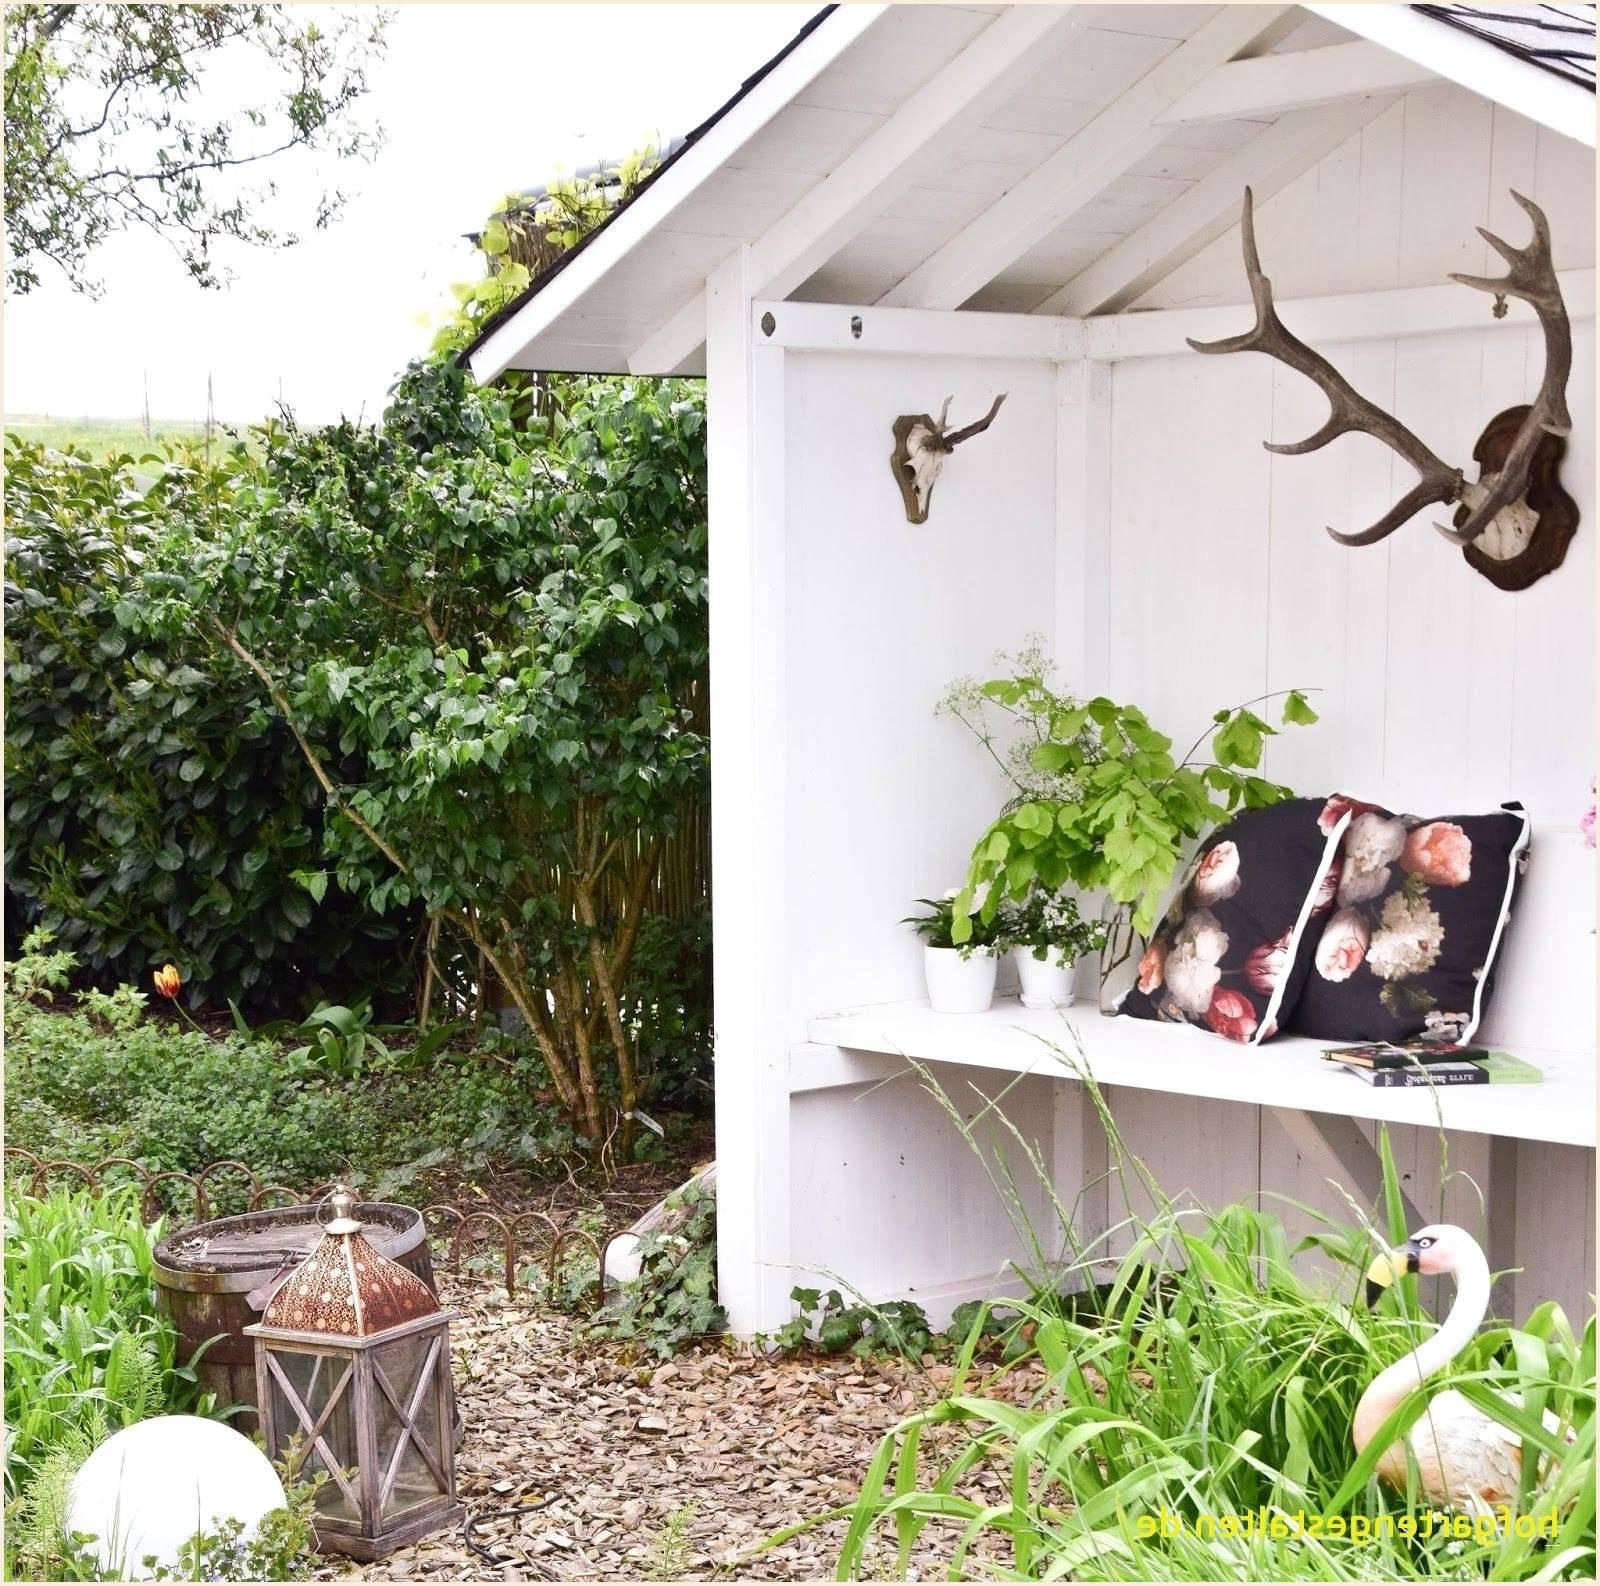 deko fur wohnzimmer ideen inspirierend 46 reizend deko fur garten und terrasse of deko fur wohnzimmer ideen